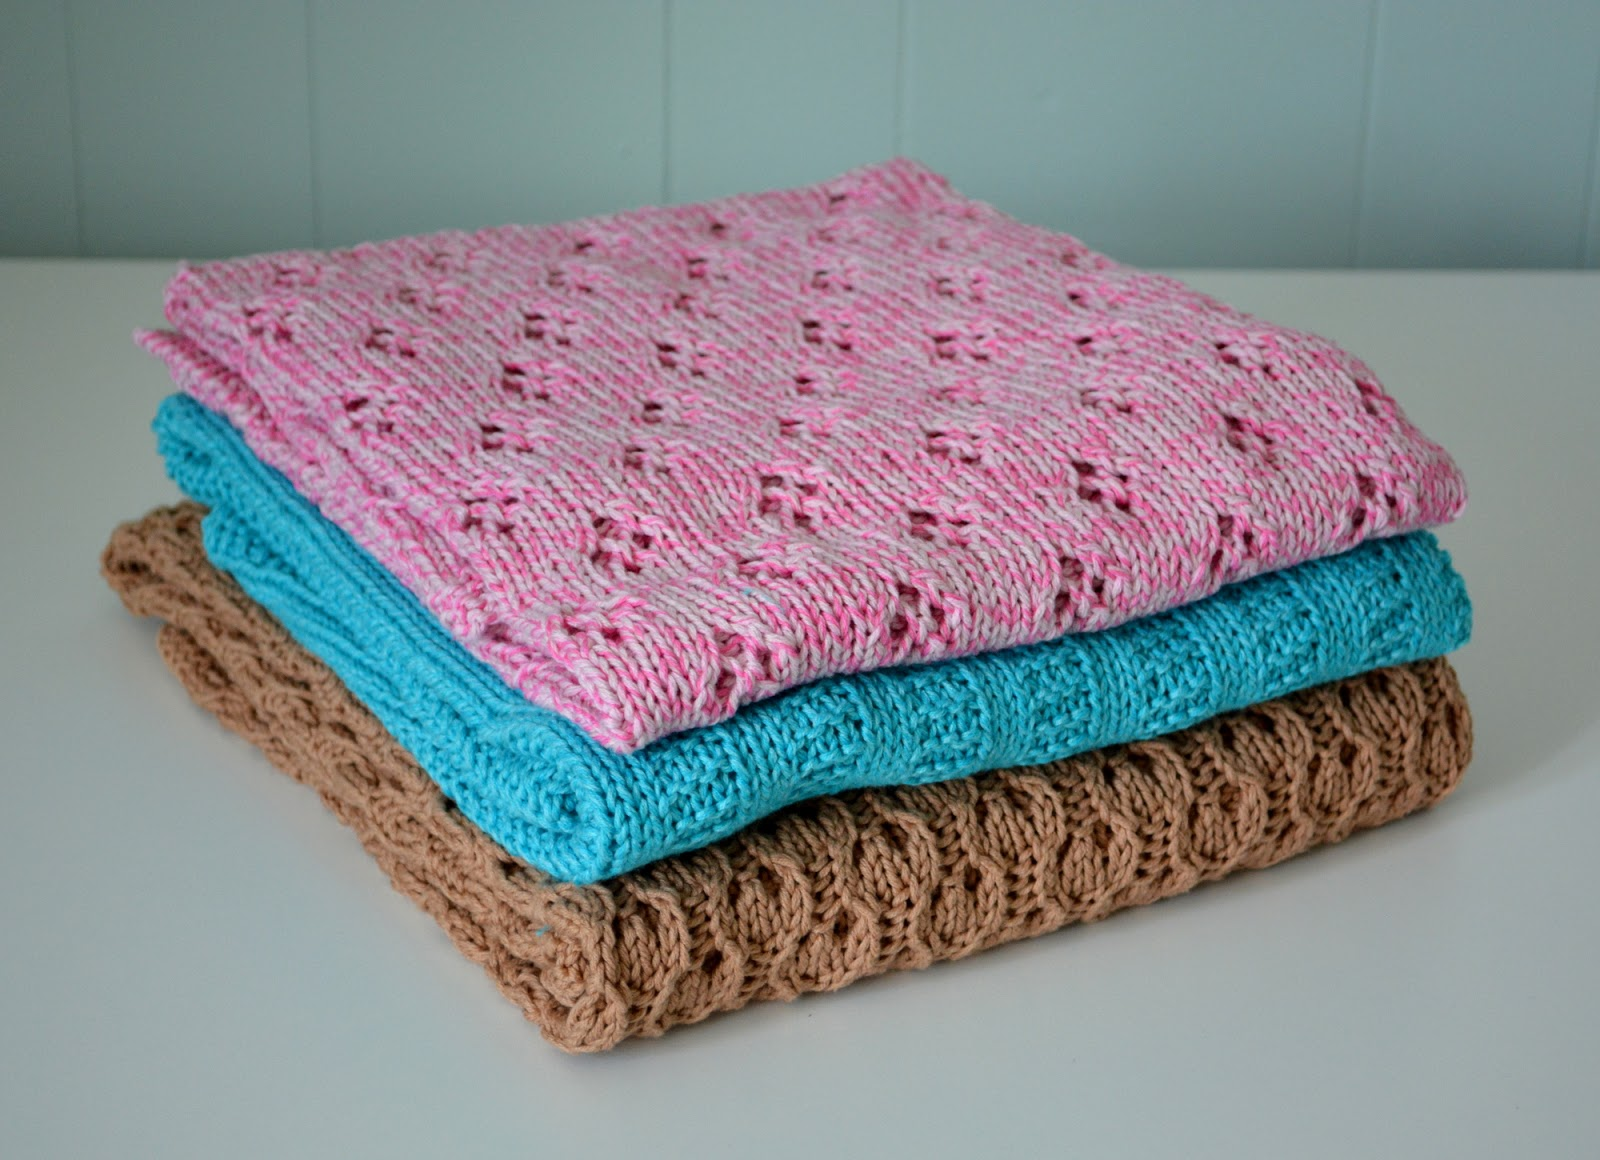 cozy birdhouse | blankets galore